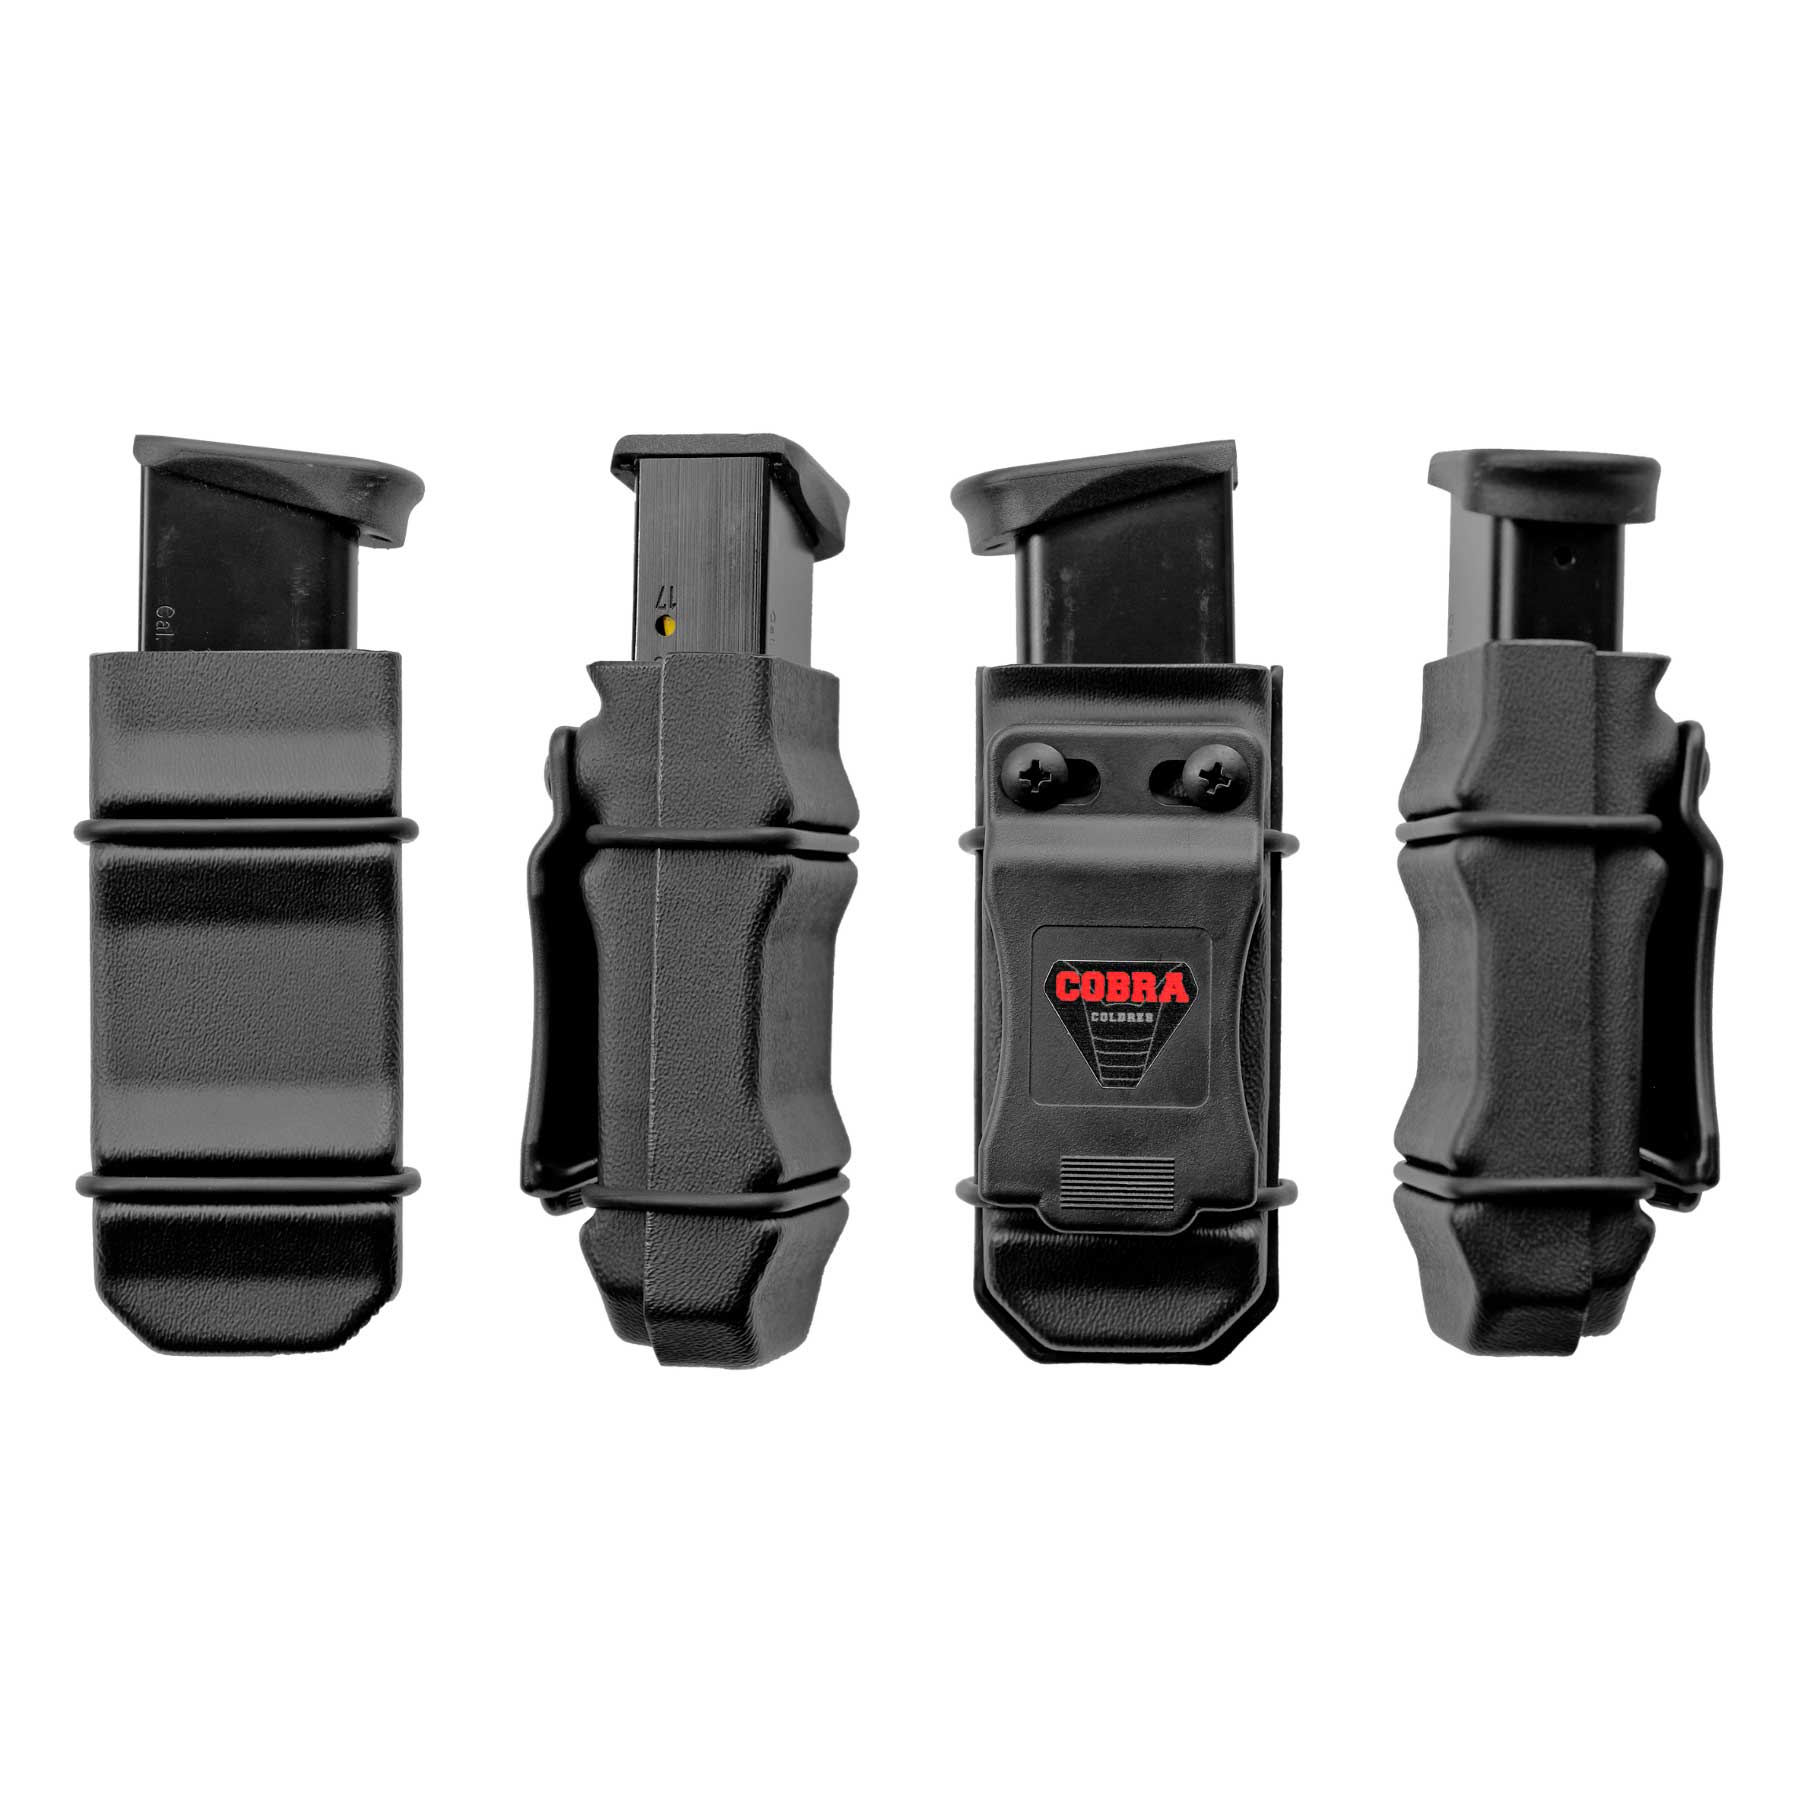 Coldre Glock [G17] [G22] [G31] Kydex + 1 Porta-Carregador Universal - Saque Rápido Velado Kydex® 080